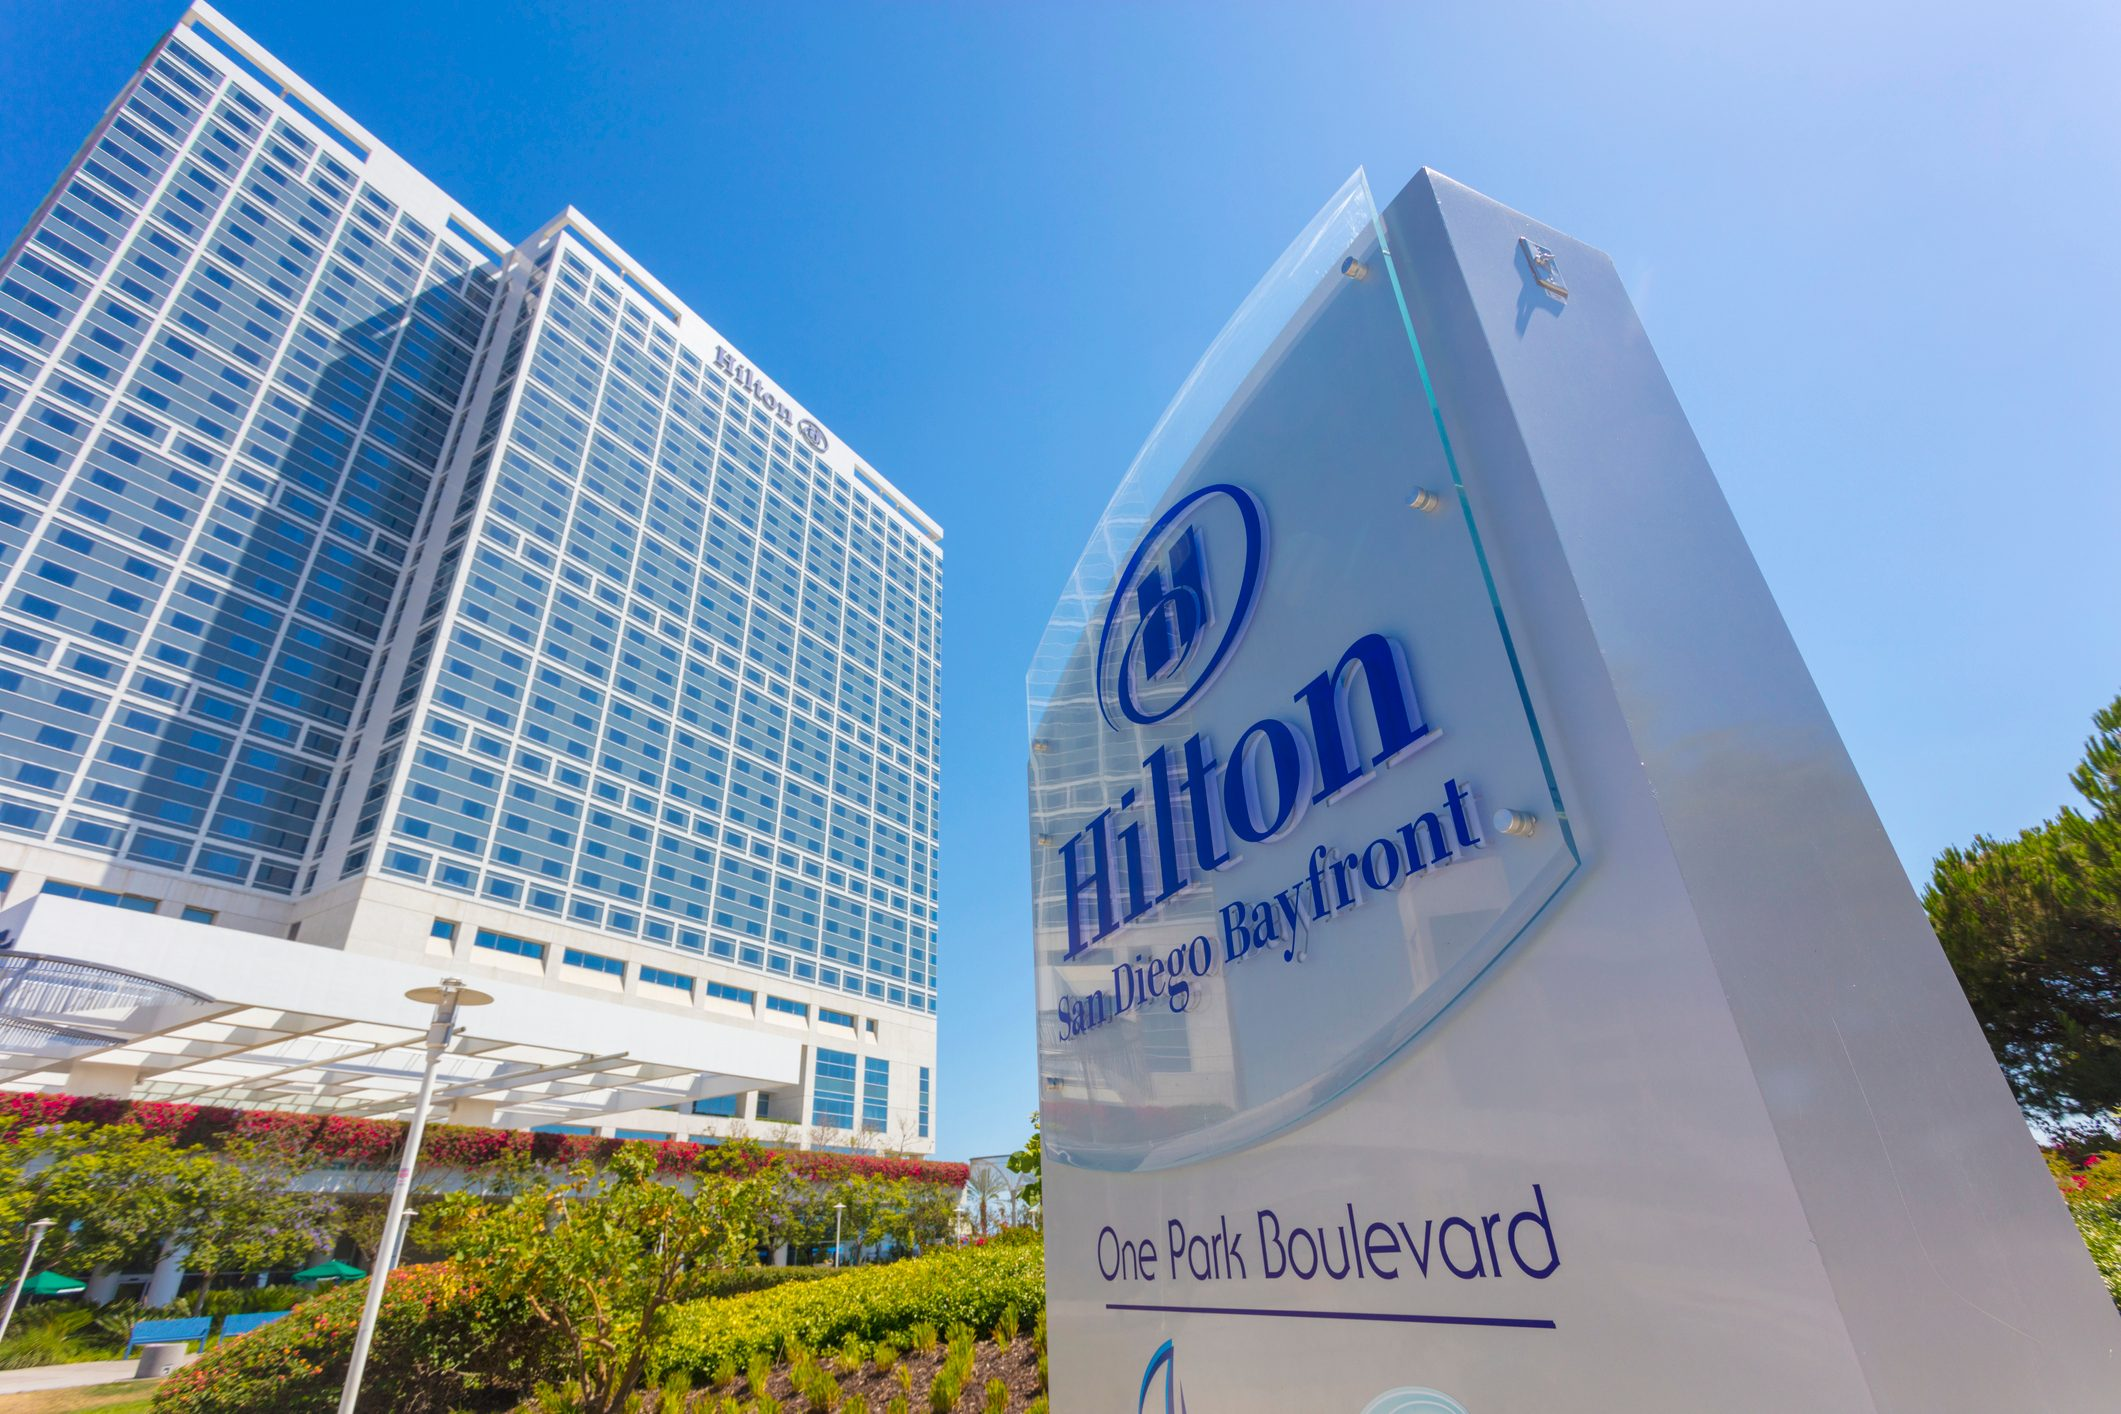 San Diego Bay Front Hilton